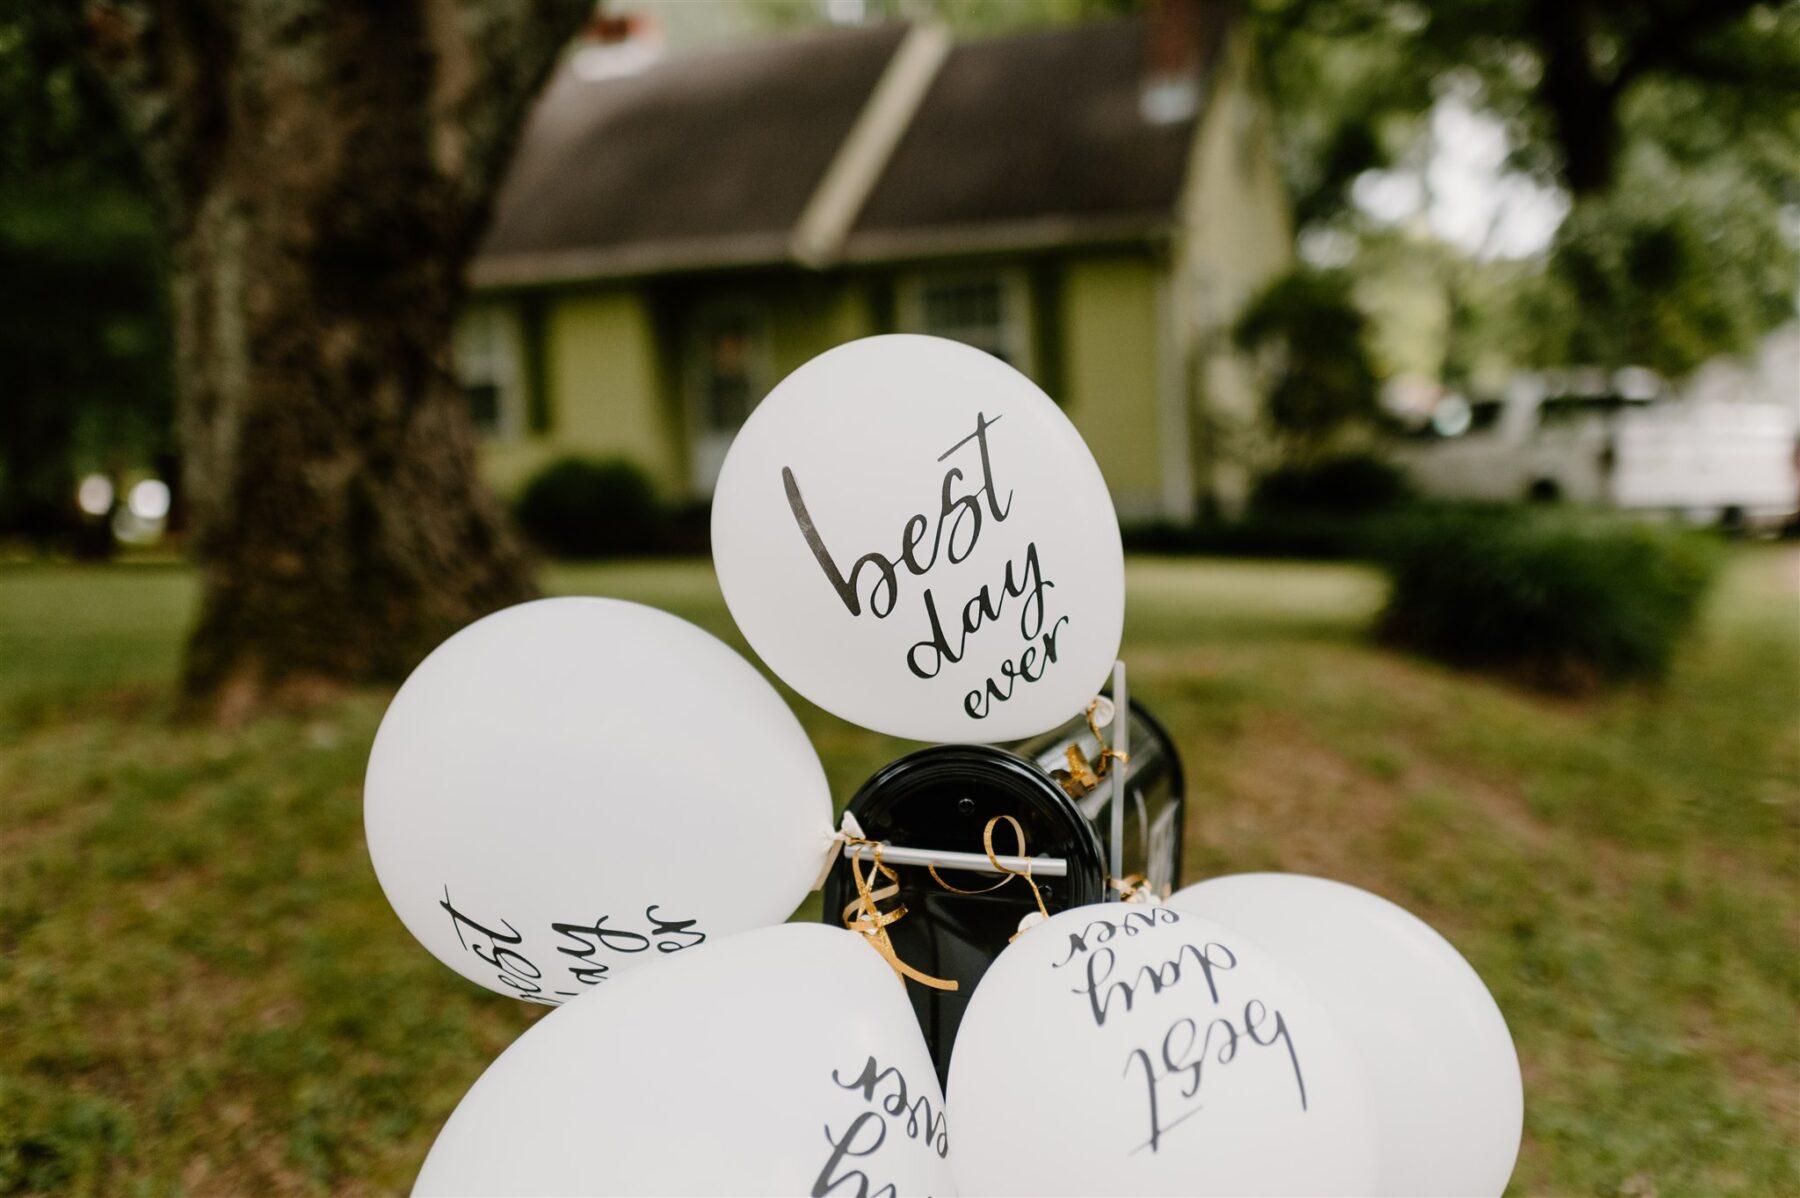 Best day ever white wedding balloons